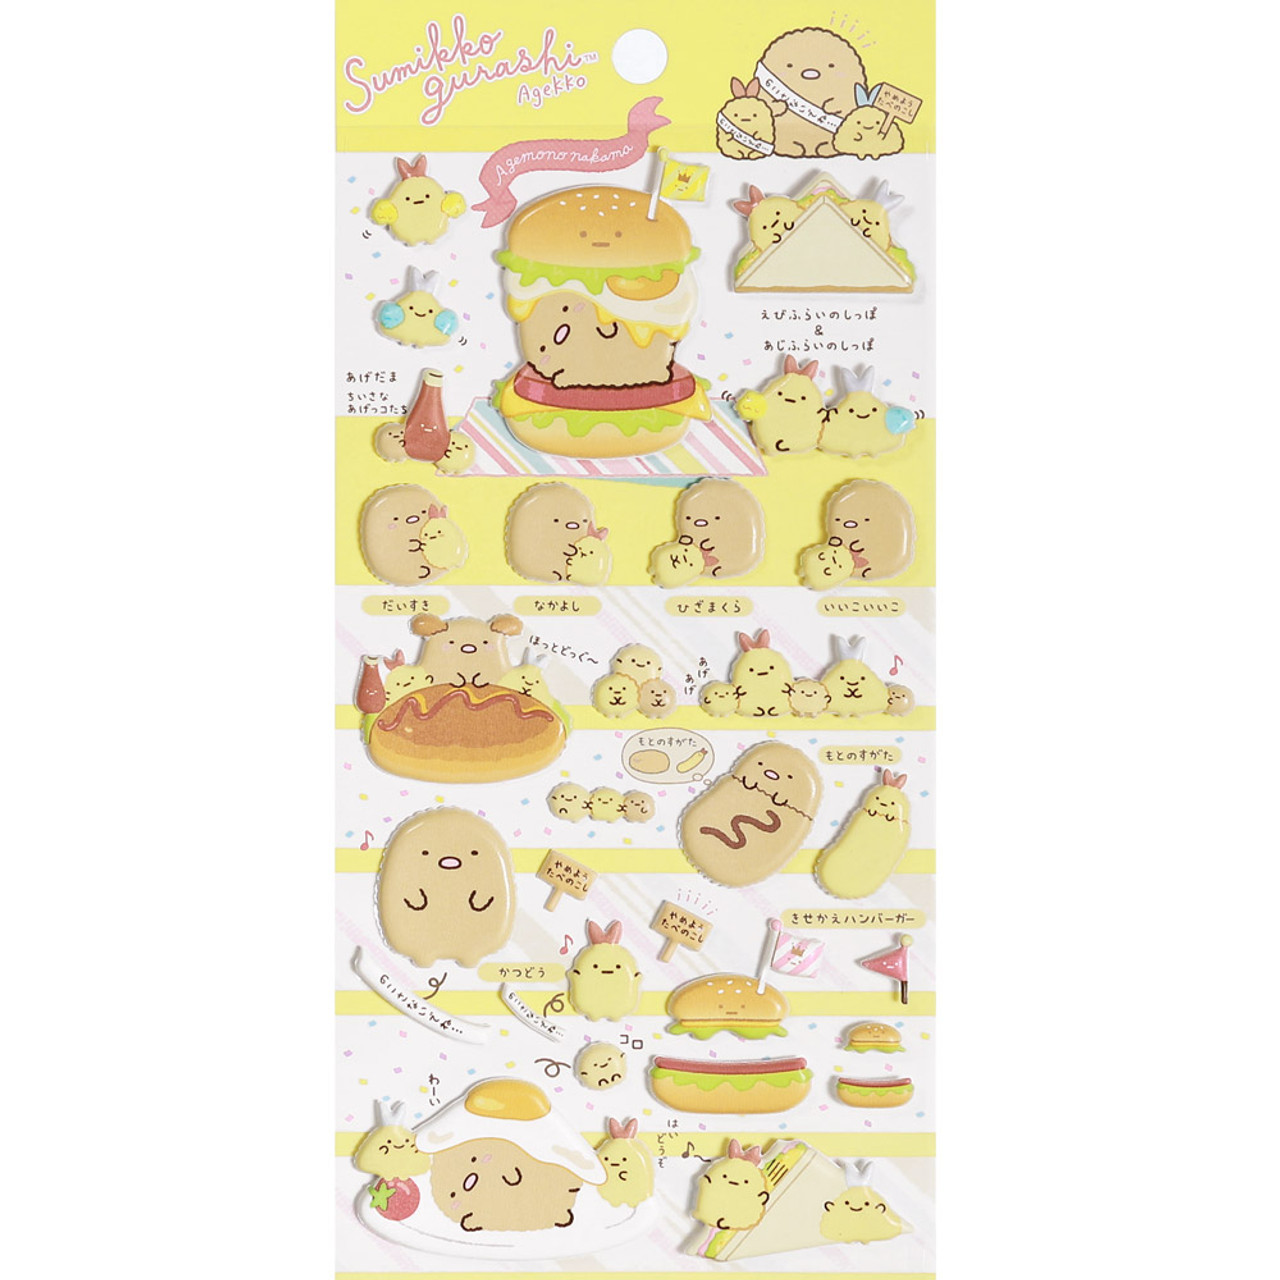 Sumikko Gurashi Funny Collection Sticker SE46501 - Eat ( Front View )